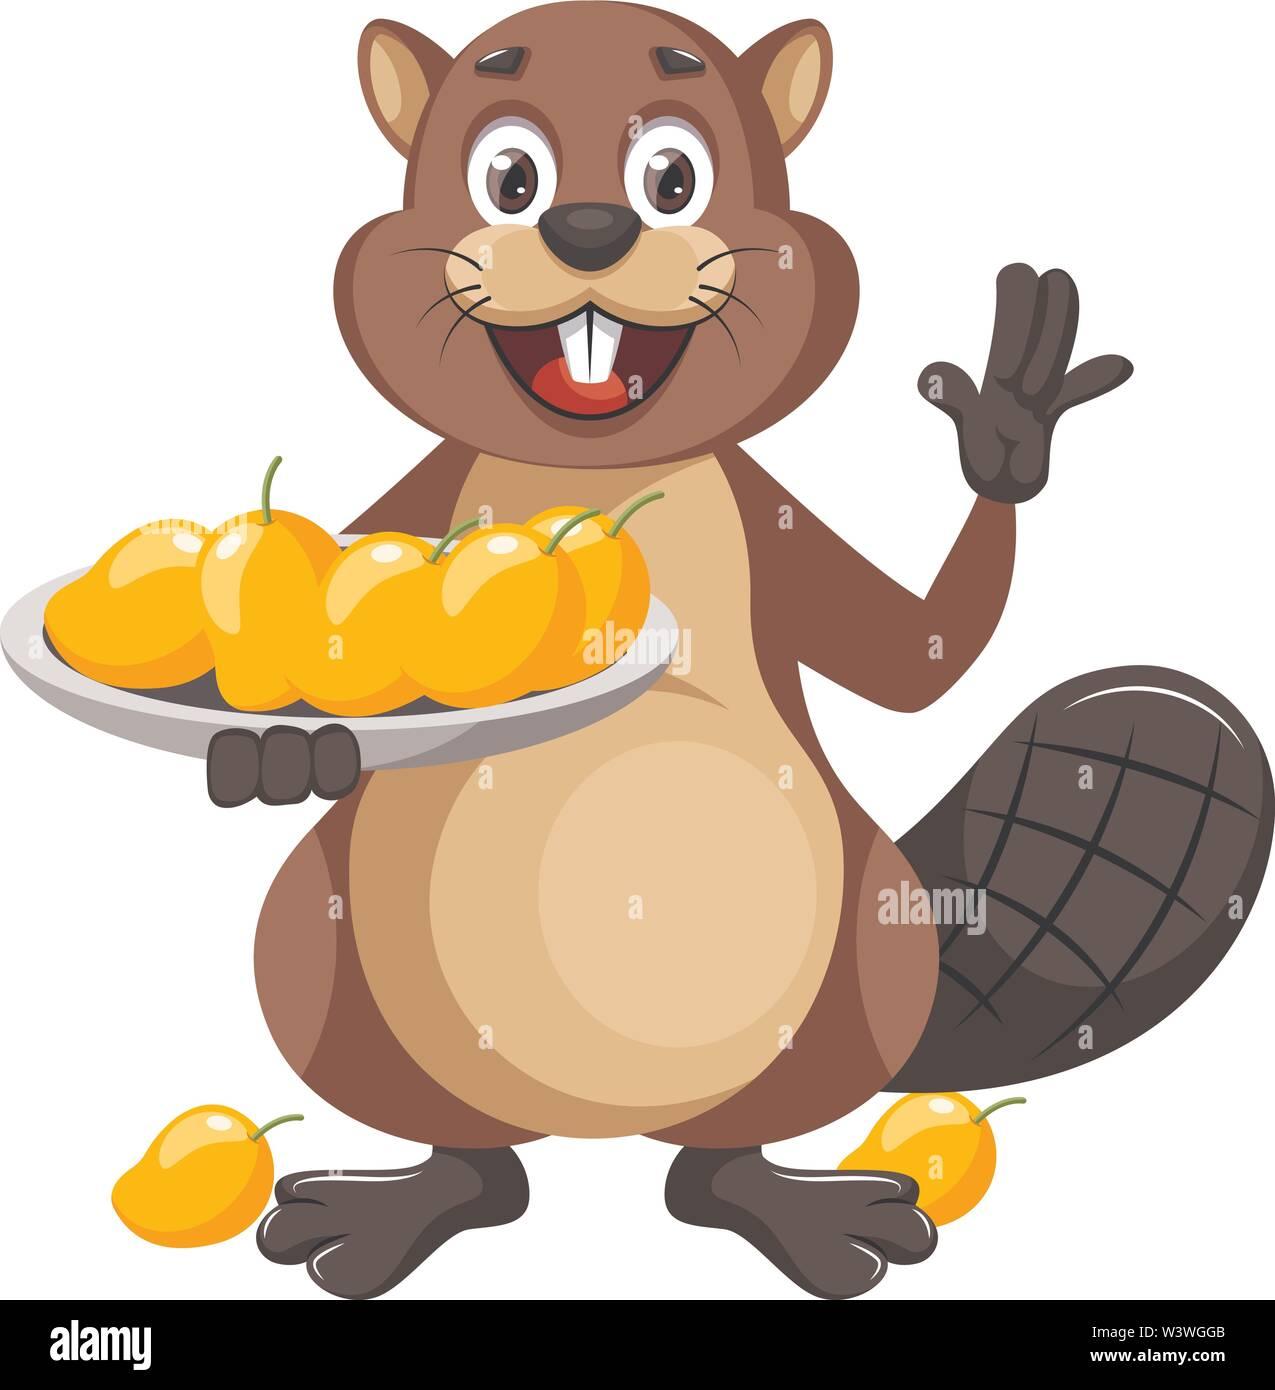 Beaver with mangos, illustration, vector on white background. - Stock Image